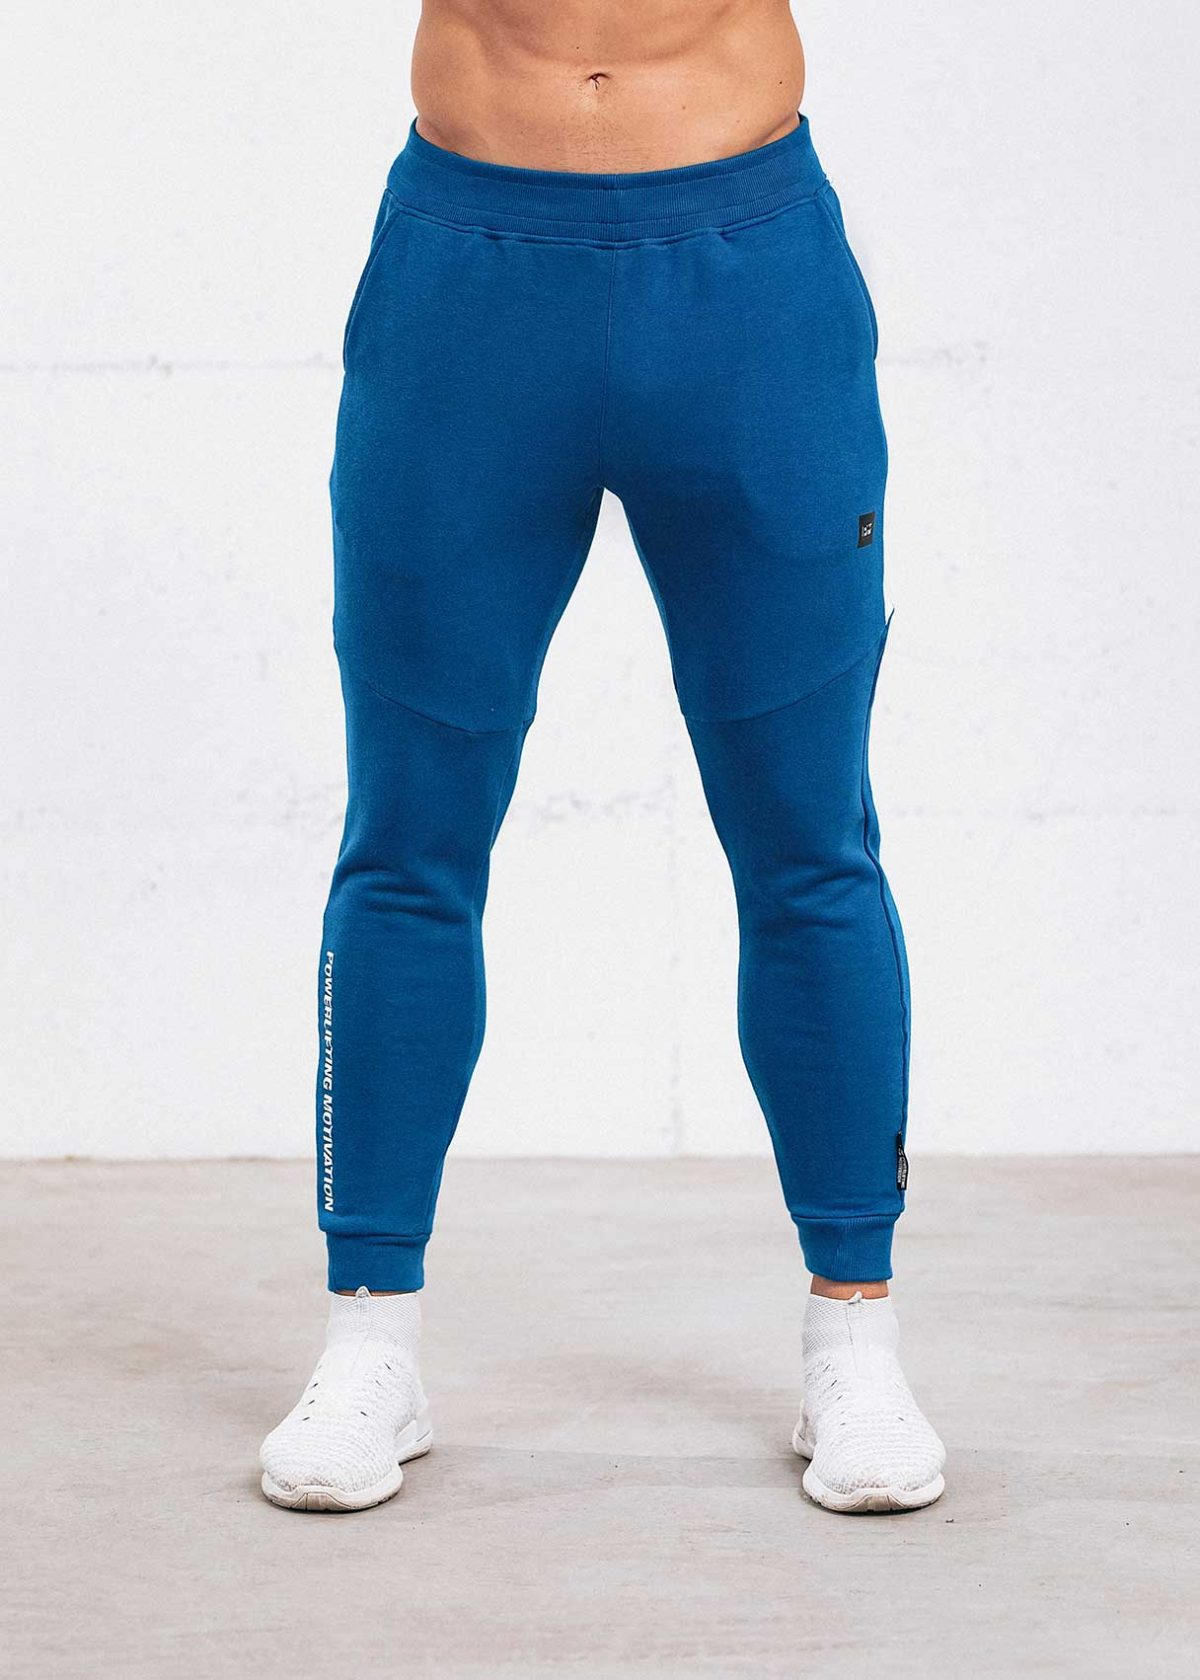 PM-ADAPT-sweatpants-front-web